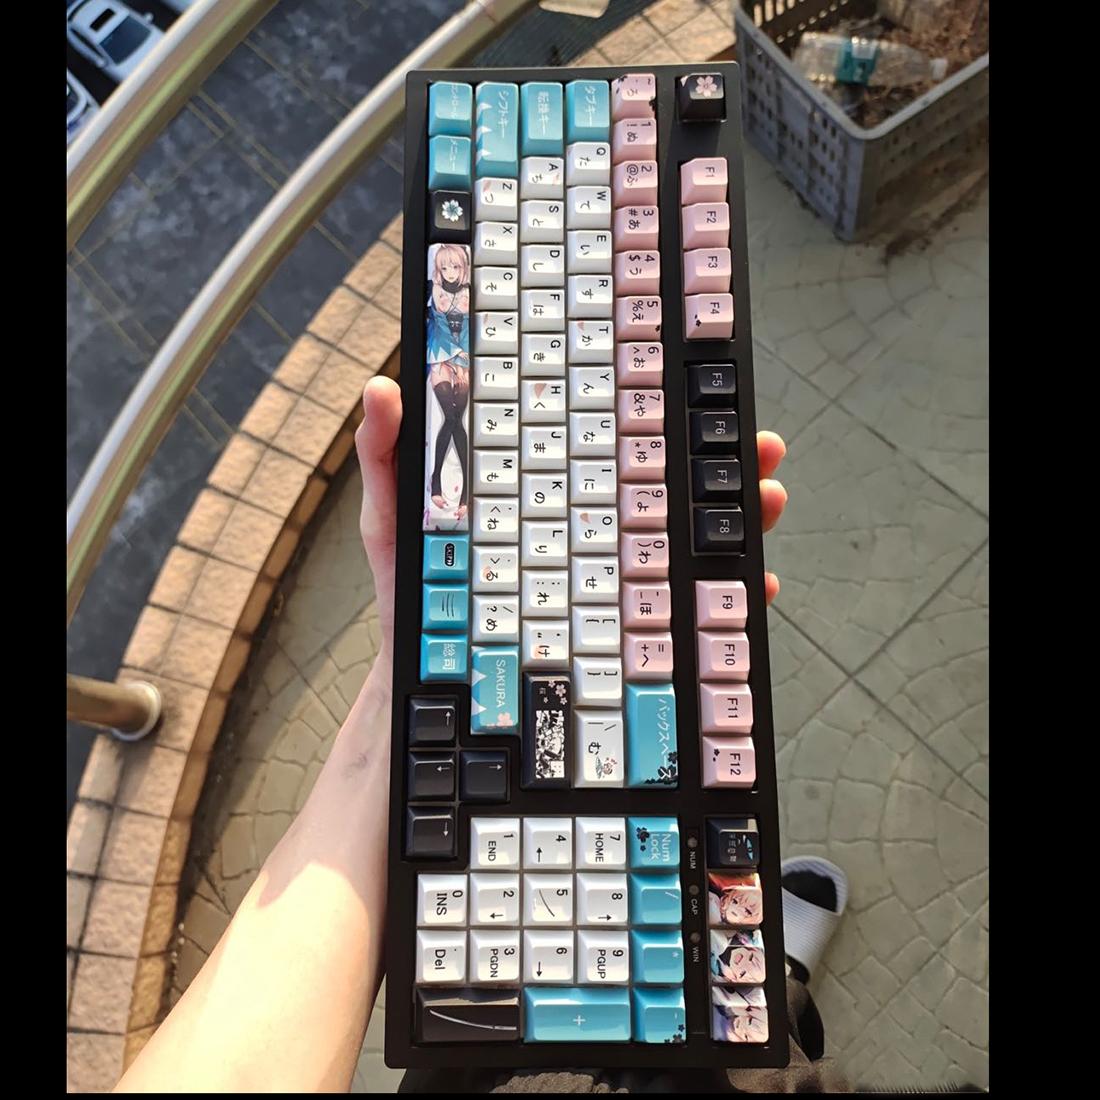 129pcs Keycaps Set PBT Dye-sub with Puller for 61/64/87/96/104 Keys GH60 RK61 Matrix Joke Custom Mechanical Gaming Keyboard